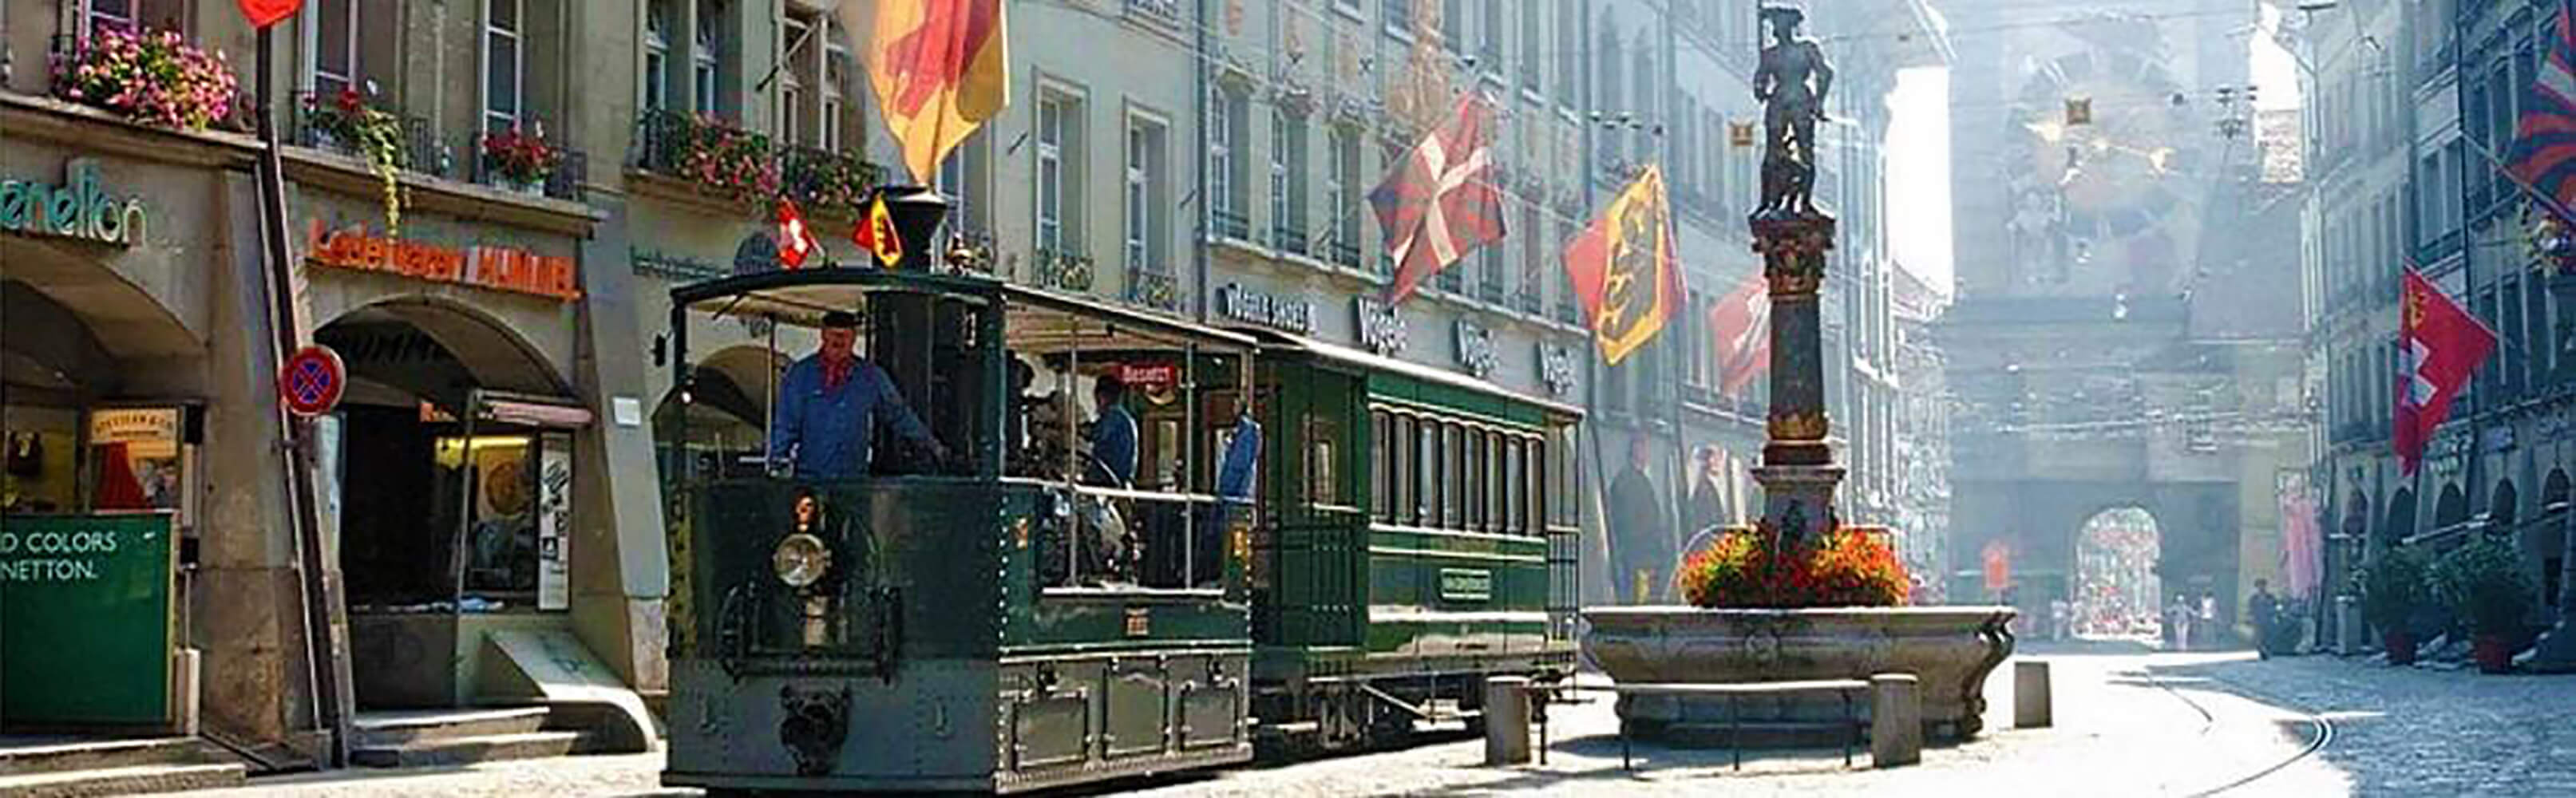 Berner Tramway-Gesellschaft 1